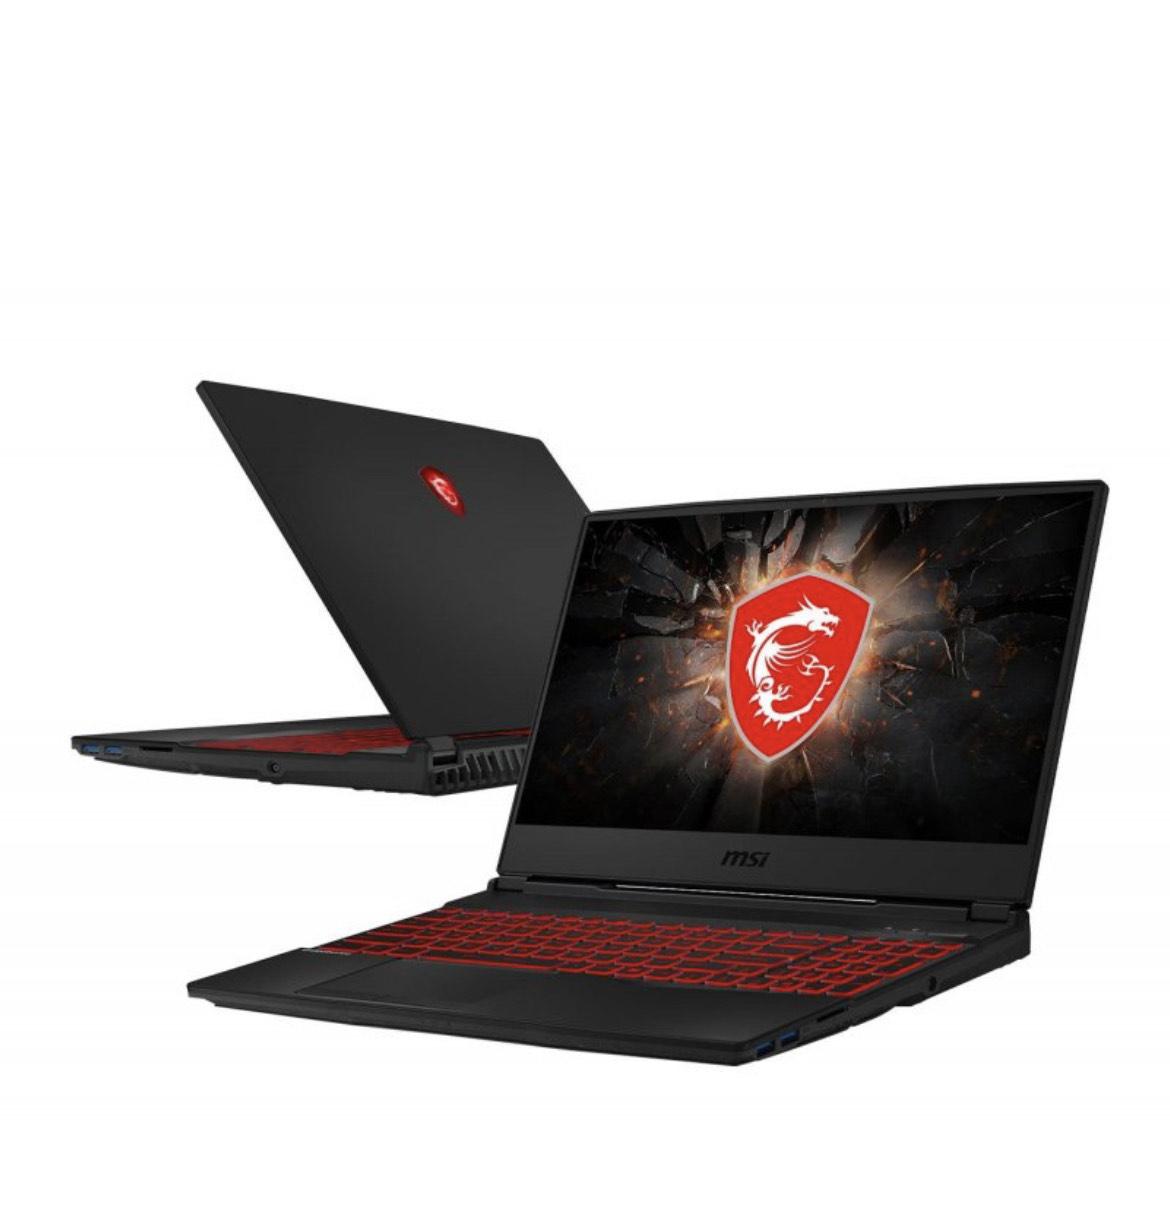 Laptop gamingowy MSI GL65 i5-10300H/16GB/256 GTX1650